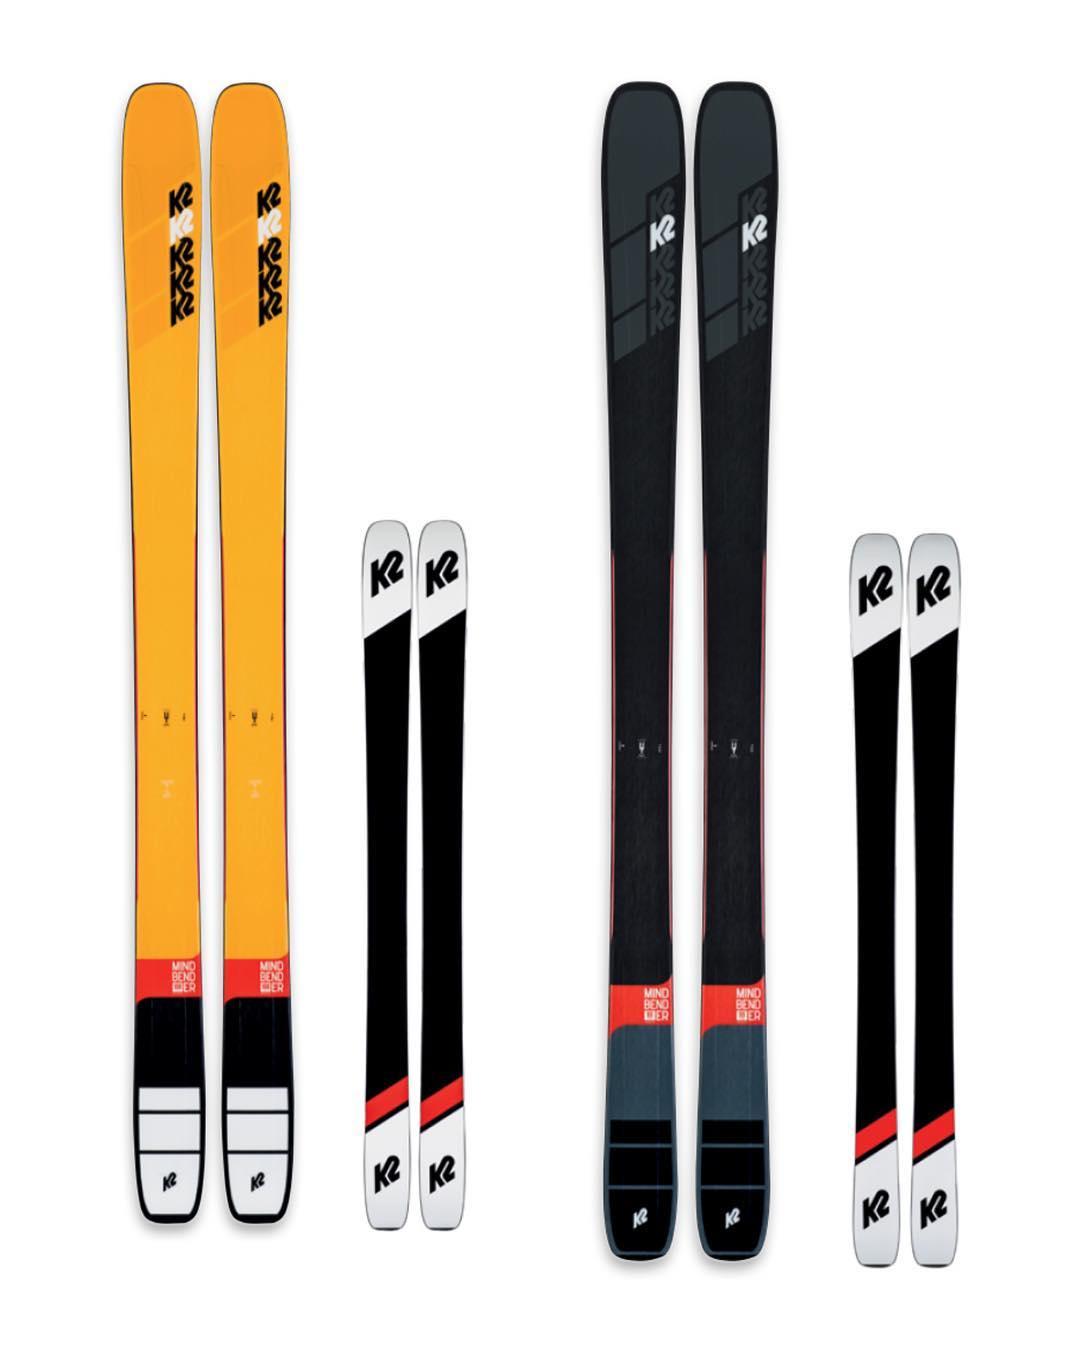 59be4414ca6 K2 MINDBENDER, skis freeride 2020 ! Nouvelle gamme ski freeride et  chaussures 2020 chez K2